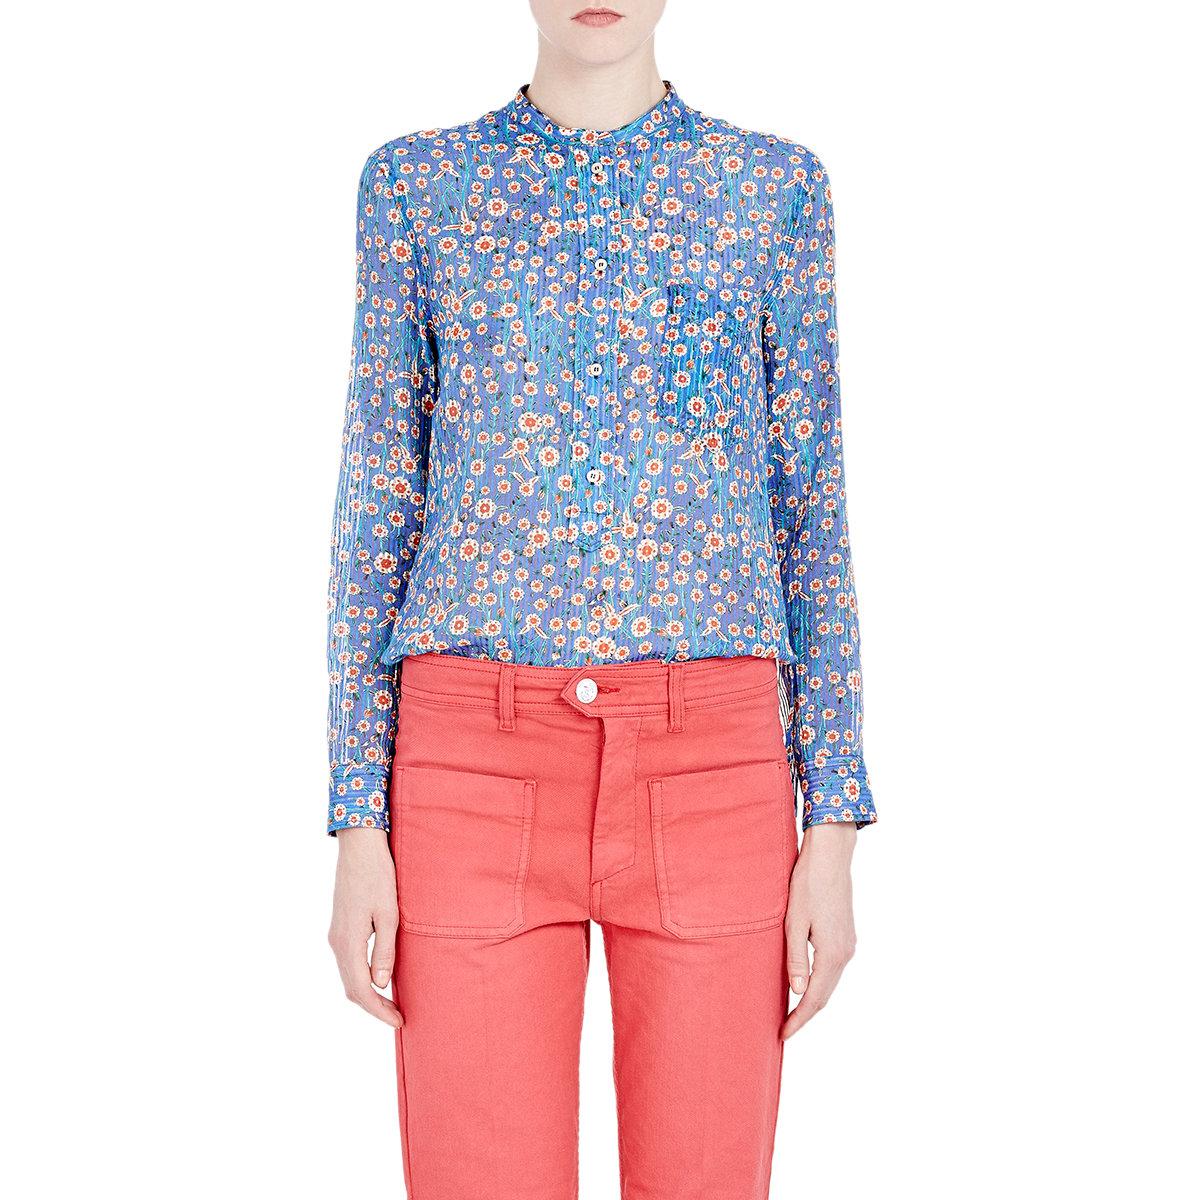 Isabel Marant Etoile Floral Blouse 59